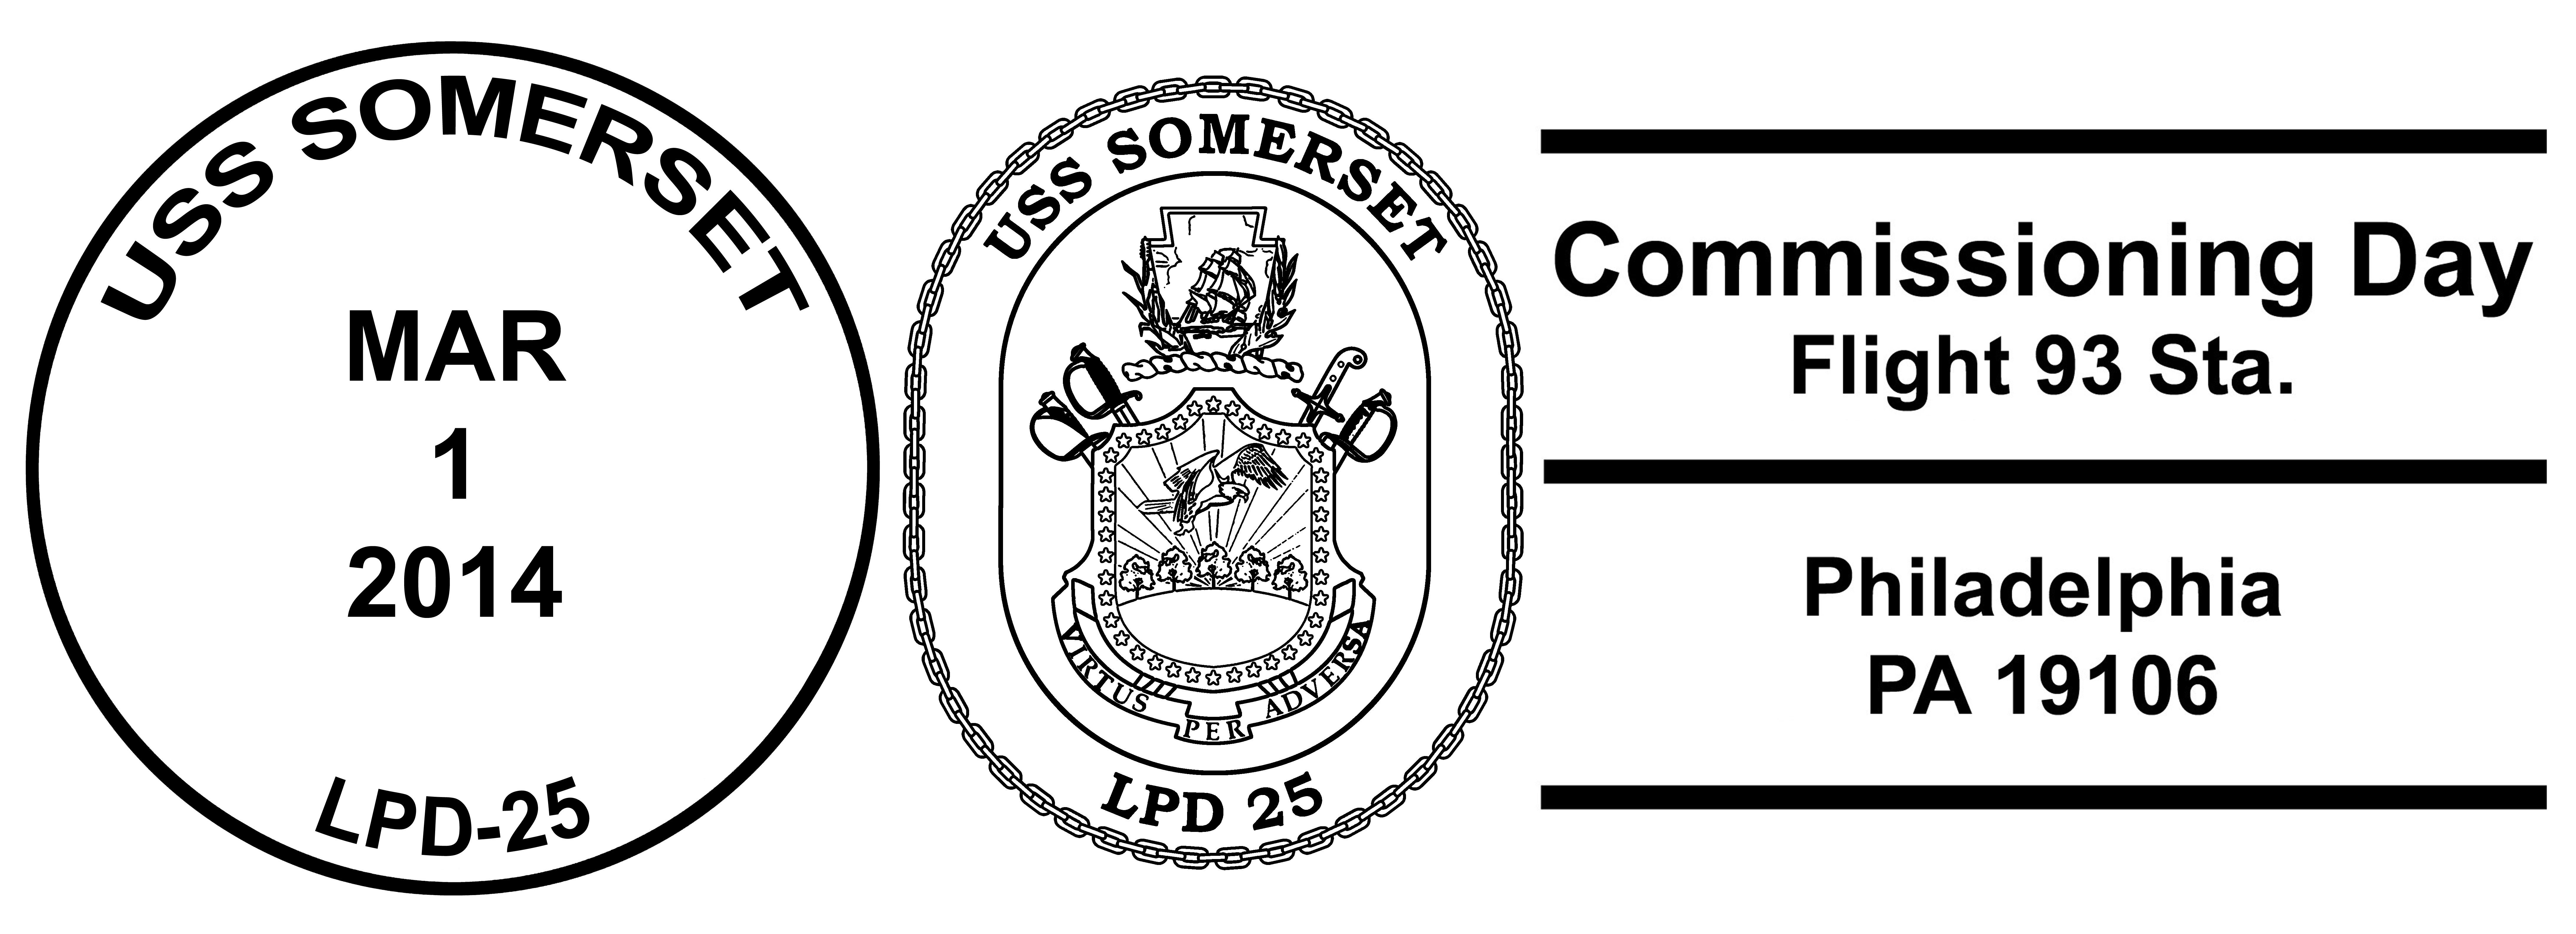 Sonderpoststempel USS SOMERSET LPD-25 Indienststellung PhiladelphiaDesign: Wolfgang Hechler